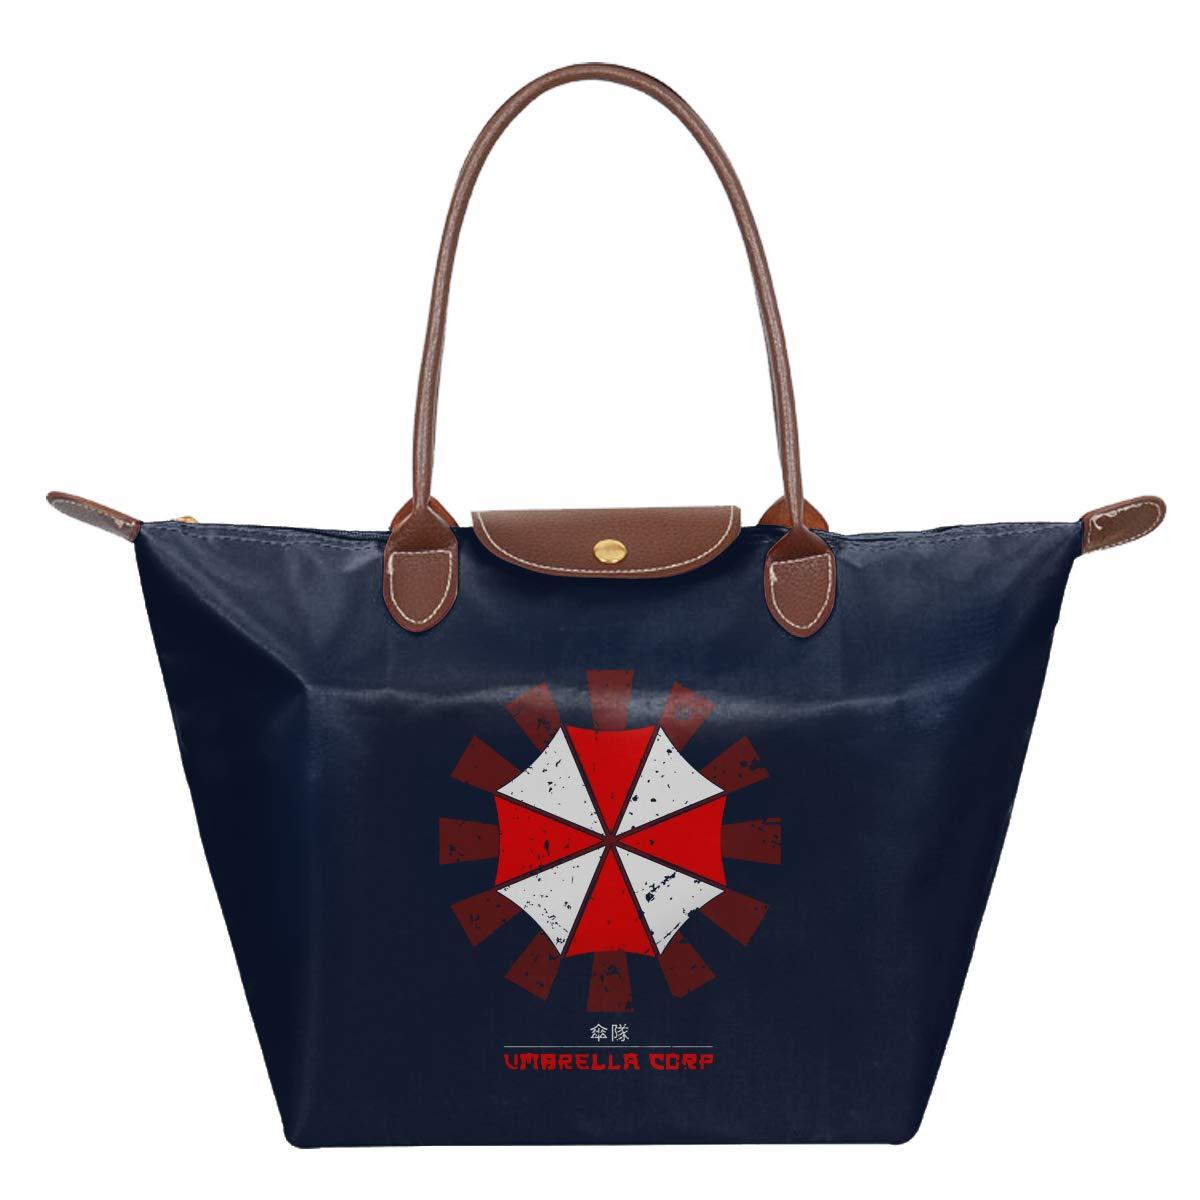 Umbrella Corp Retro Japanese Resident Evil Waterproof Leather Folded Messenger Nylon Bag Travel Tote Hopping Folding School Handbags